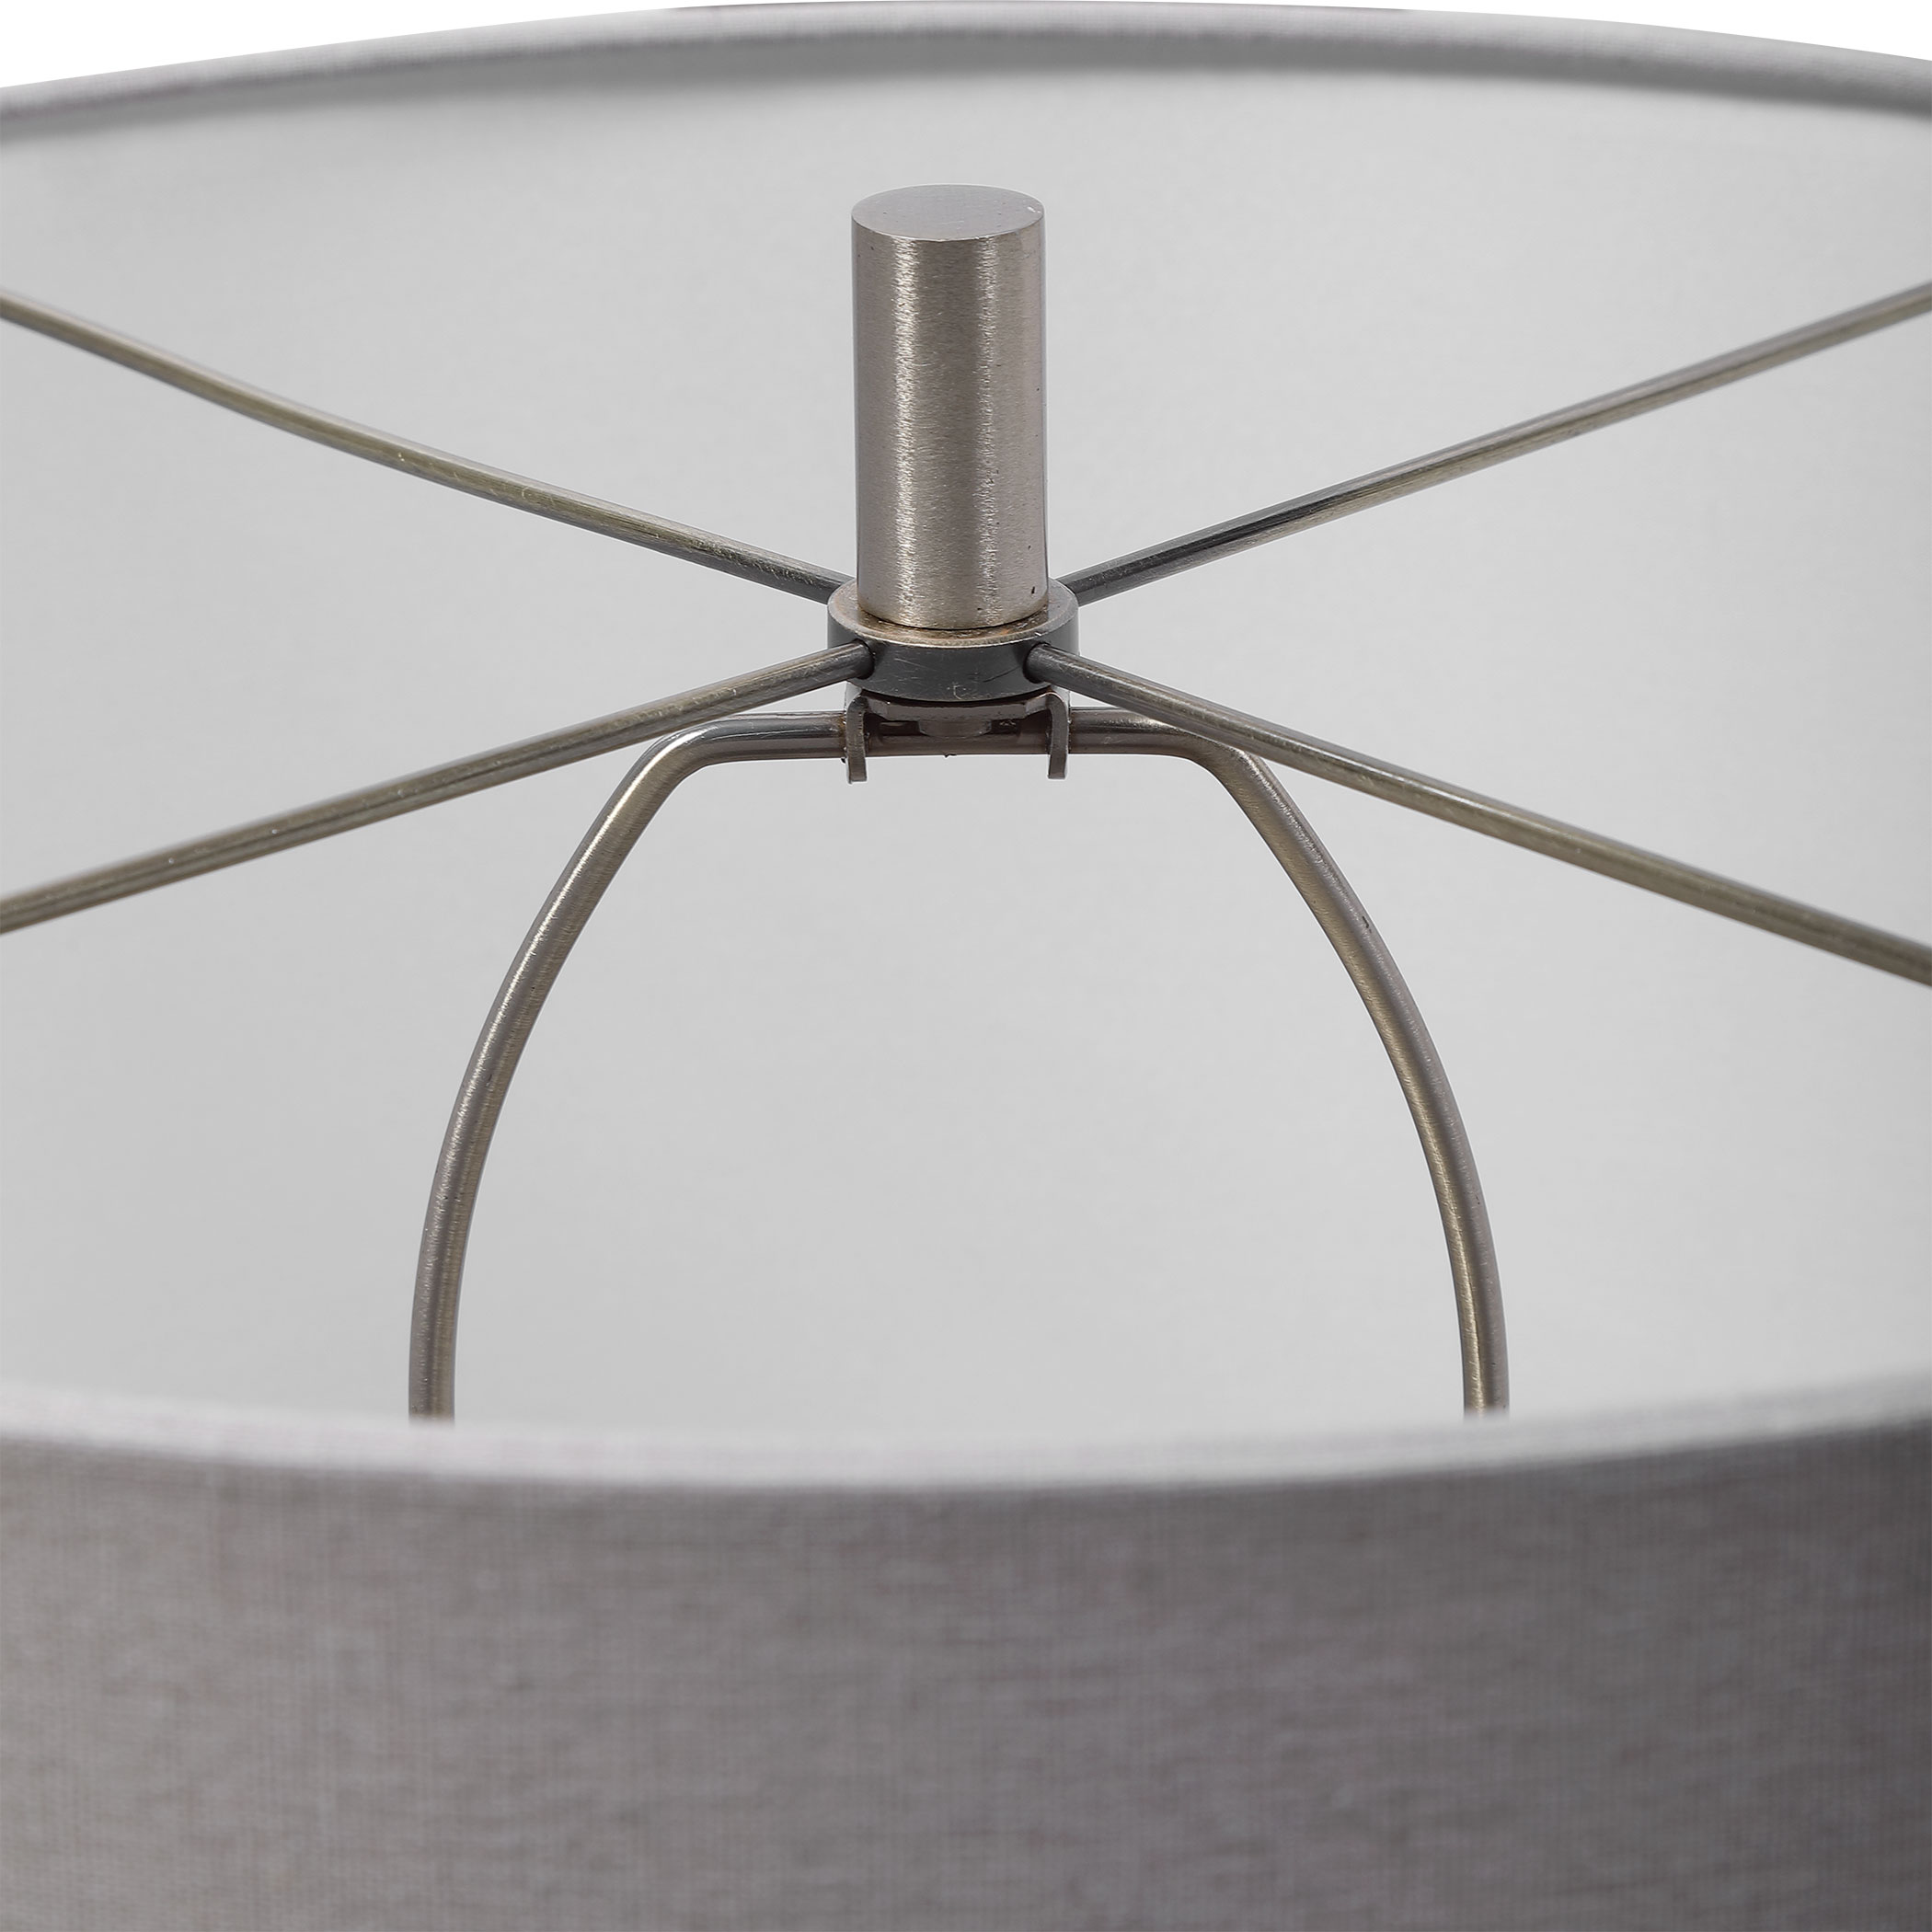 Winterscape White Glaze Table Lamp - AUG 01, 2021